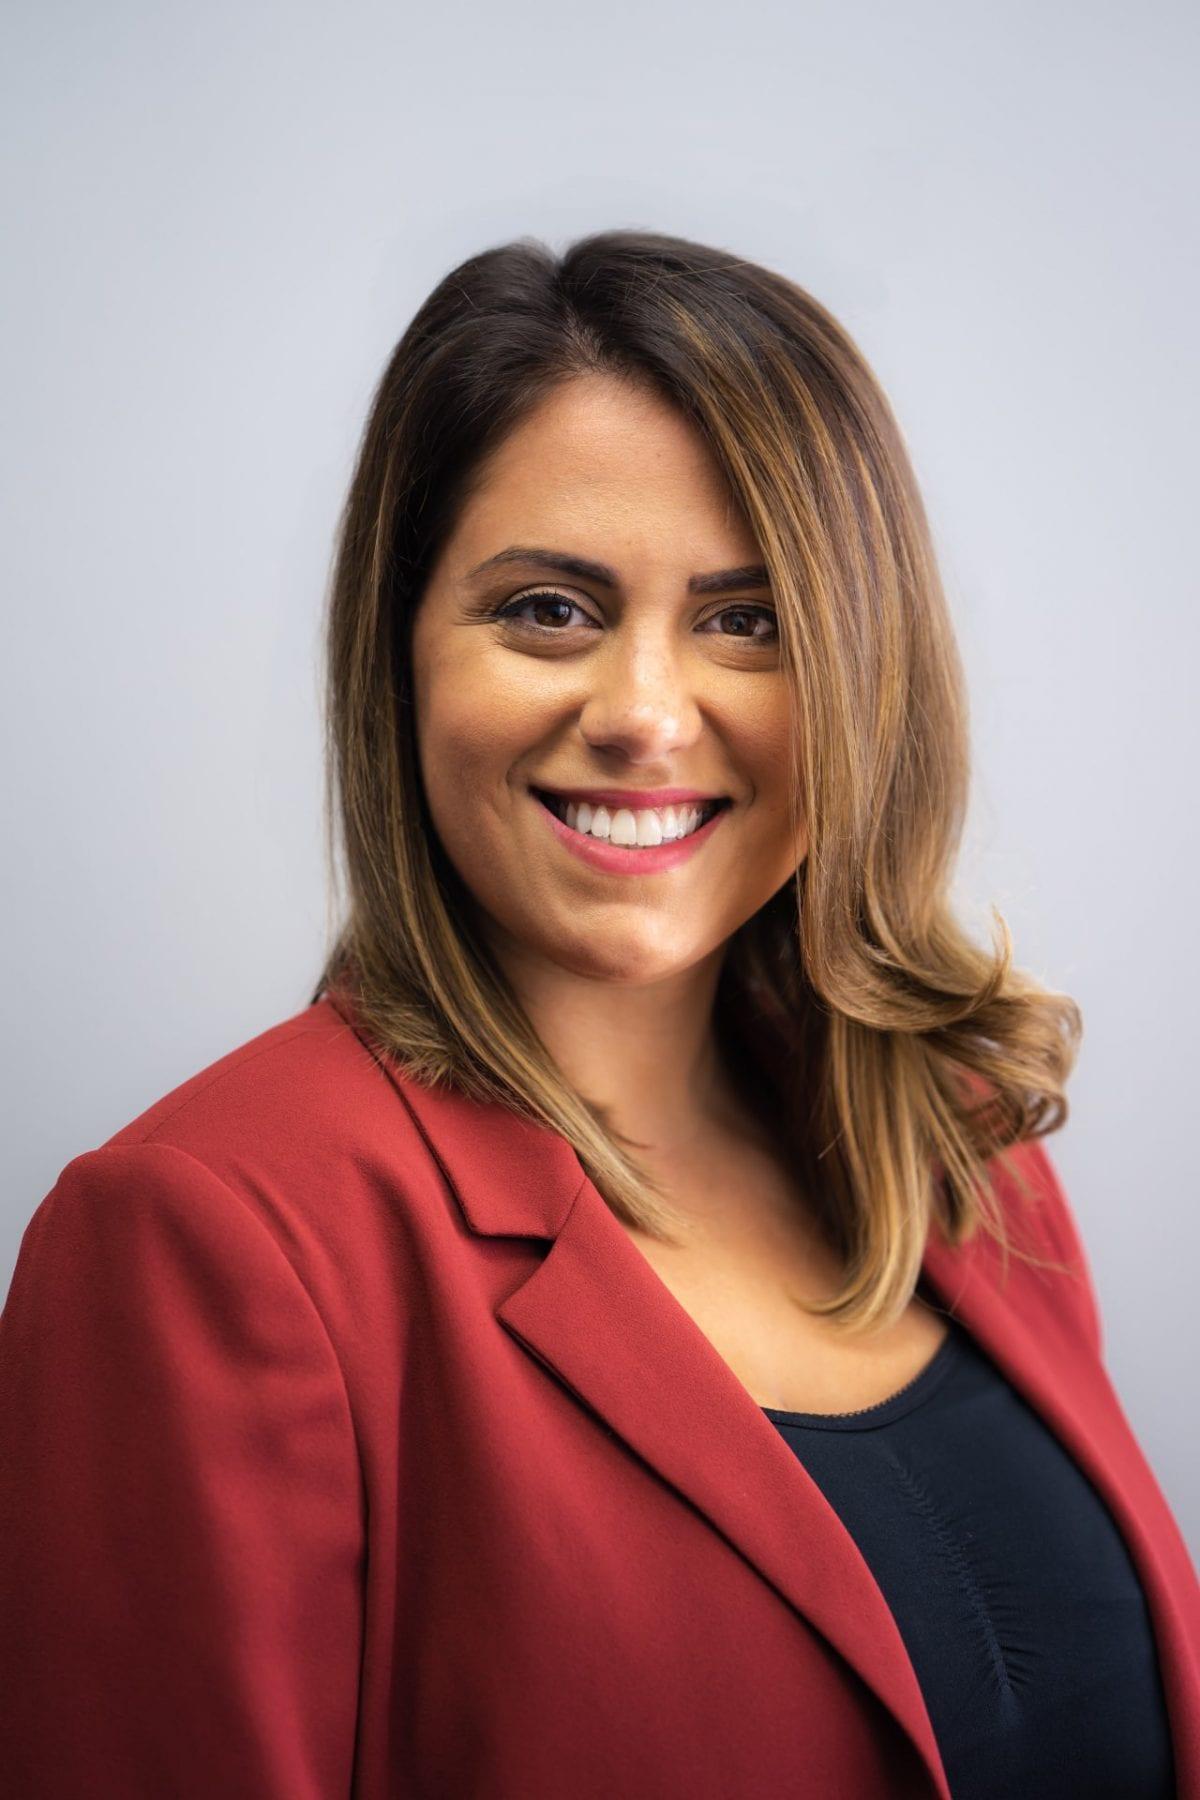 Danielle Montalto-Bly, ESQ.